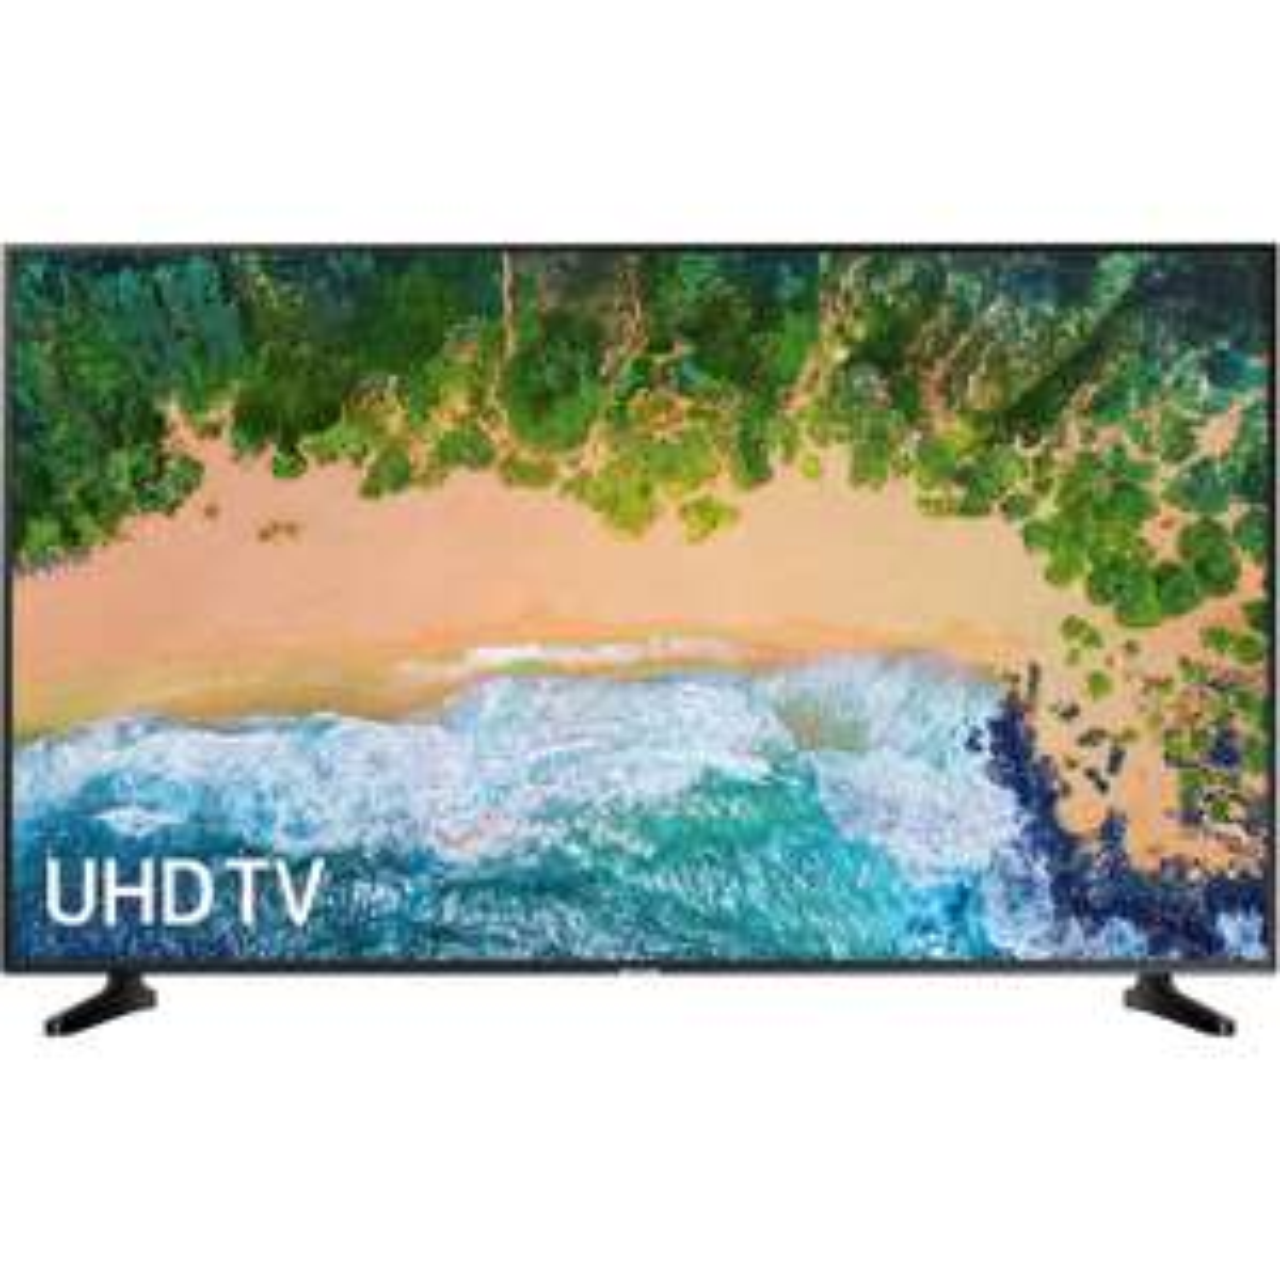 Samsung UE55NU7021 55 inch 4K Ultra HD HDR Smart LED TV TVPlus - £455 @ AO.com